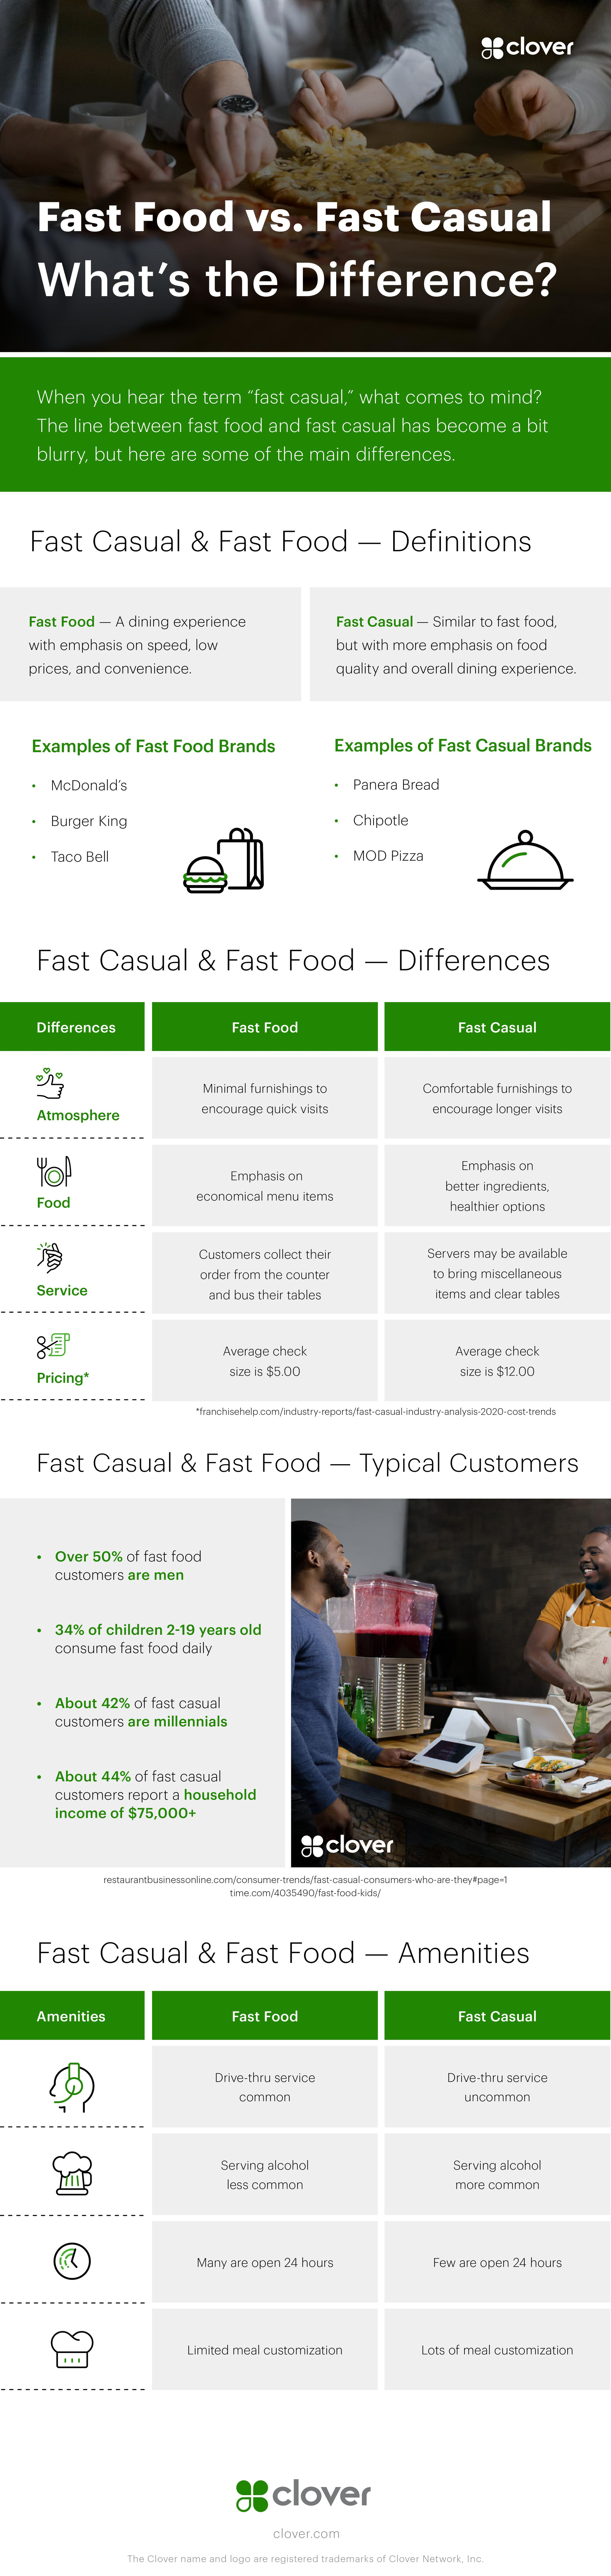 fast food vs fast casual